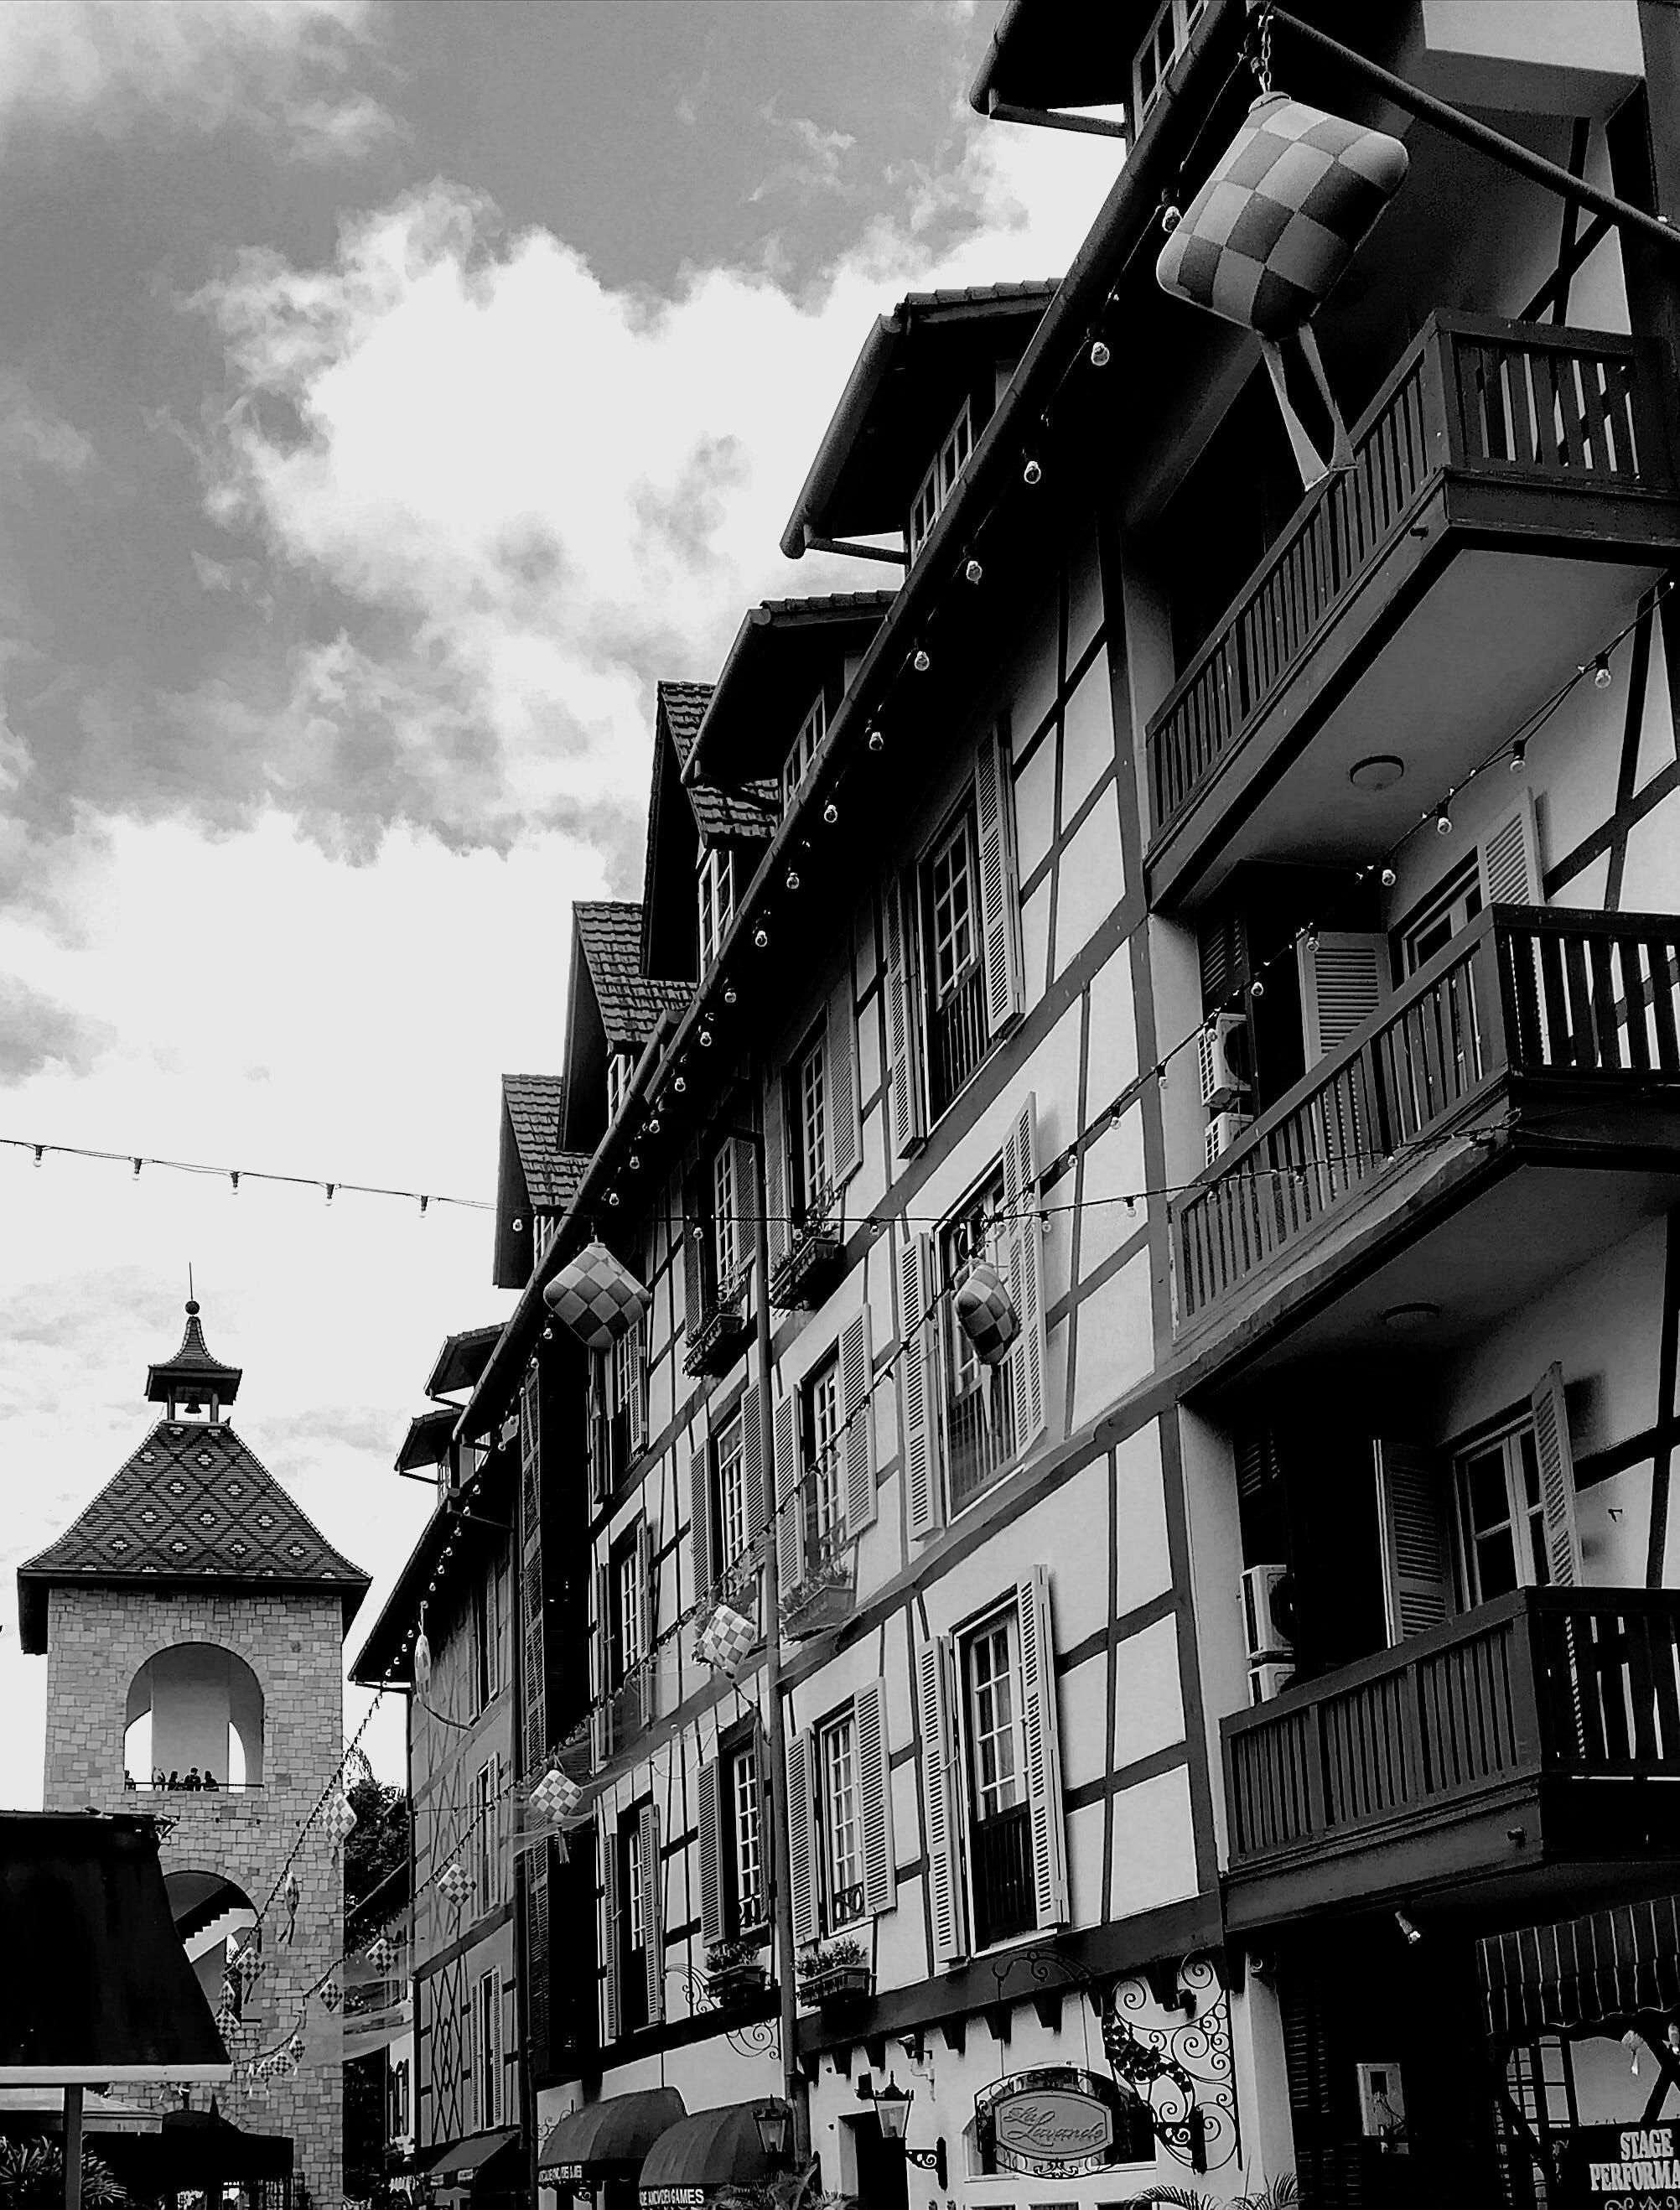 apartment, balcony, black-and-white